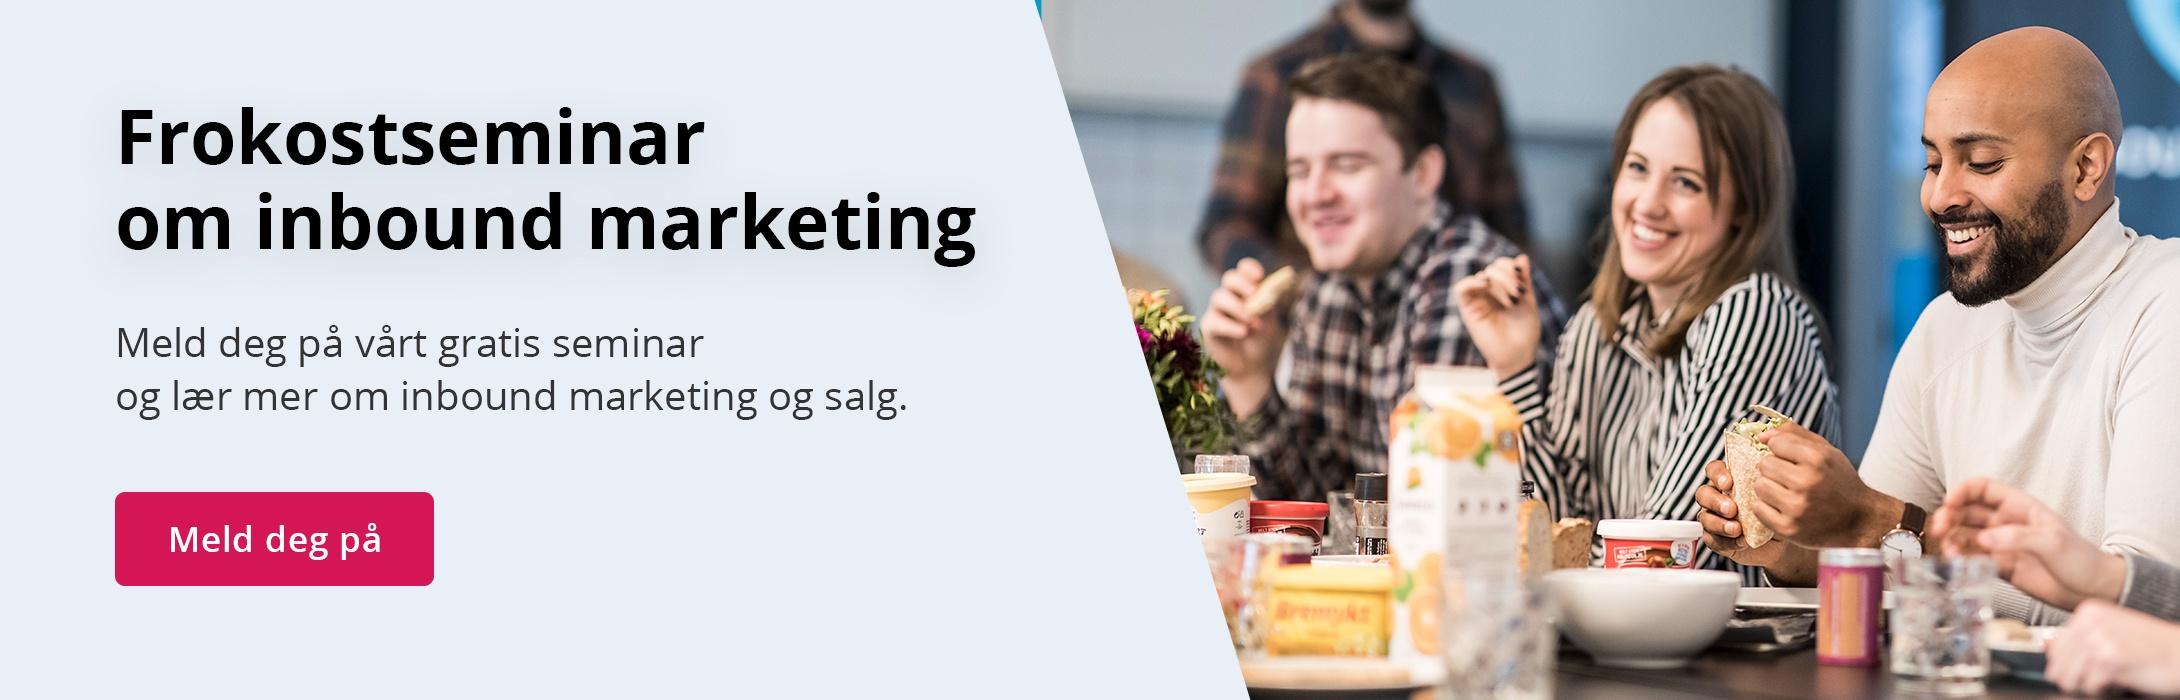 frokostseminar inbound marketing og salg